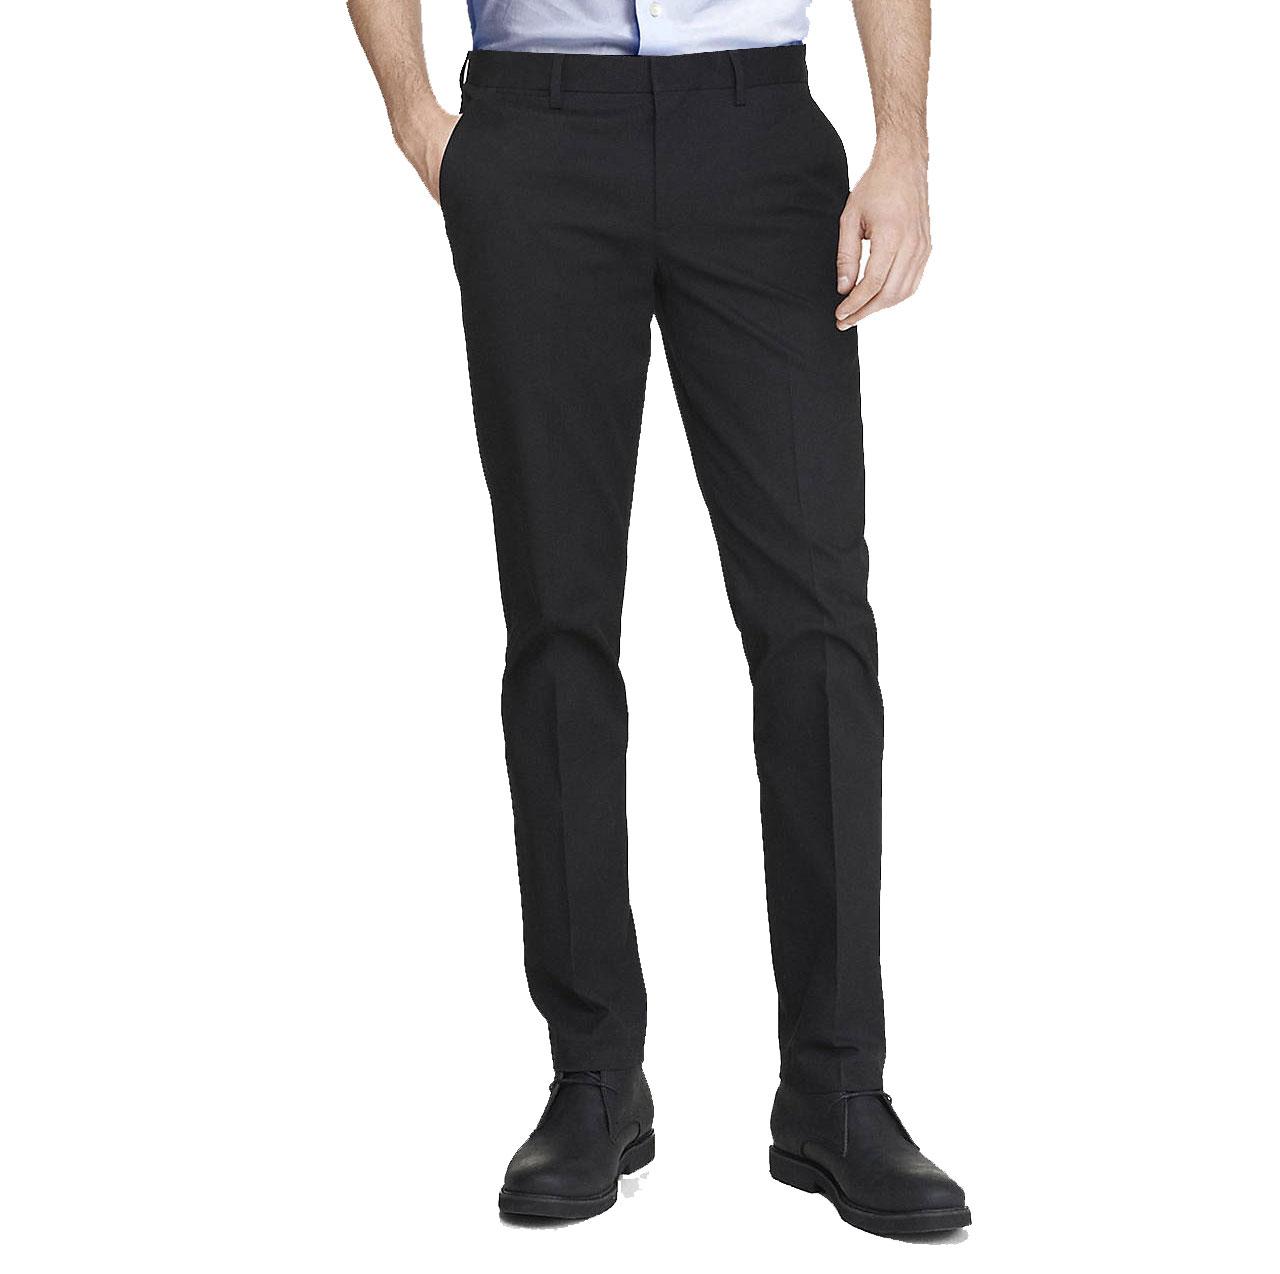 Solid Dress Men Pants / Slacks EBPS151M